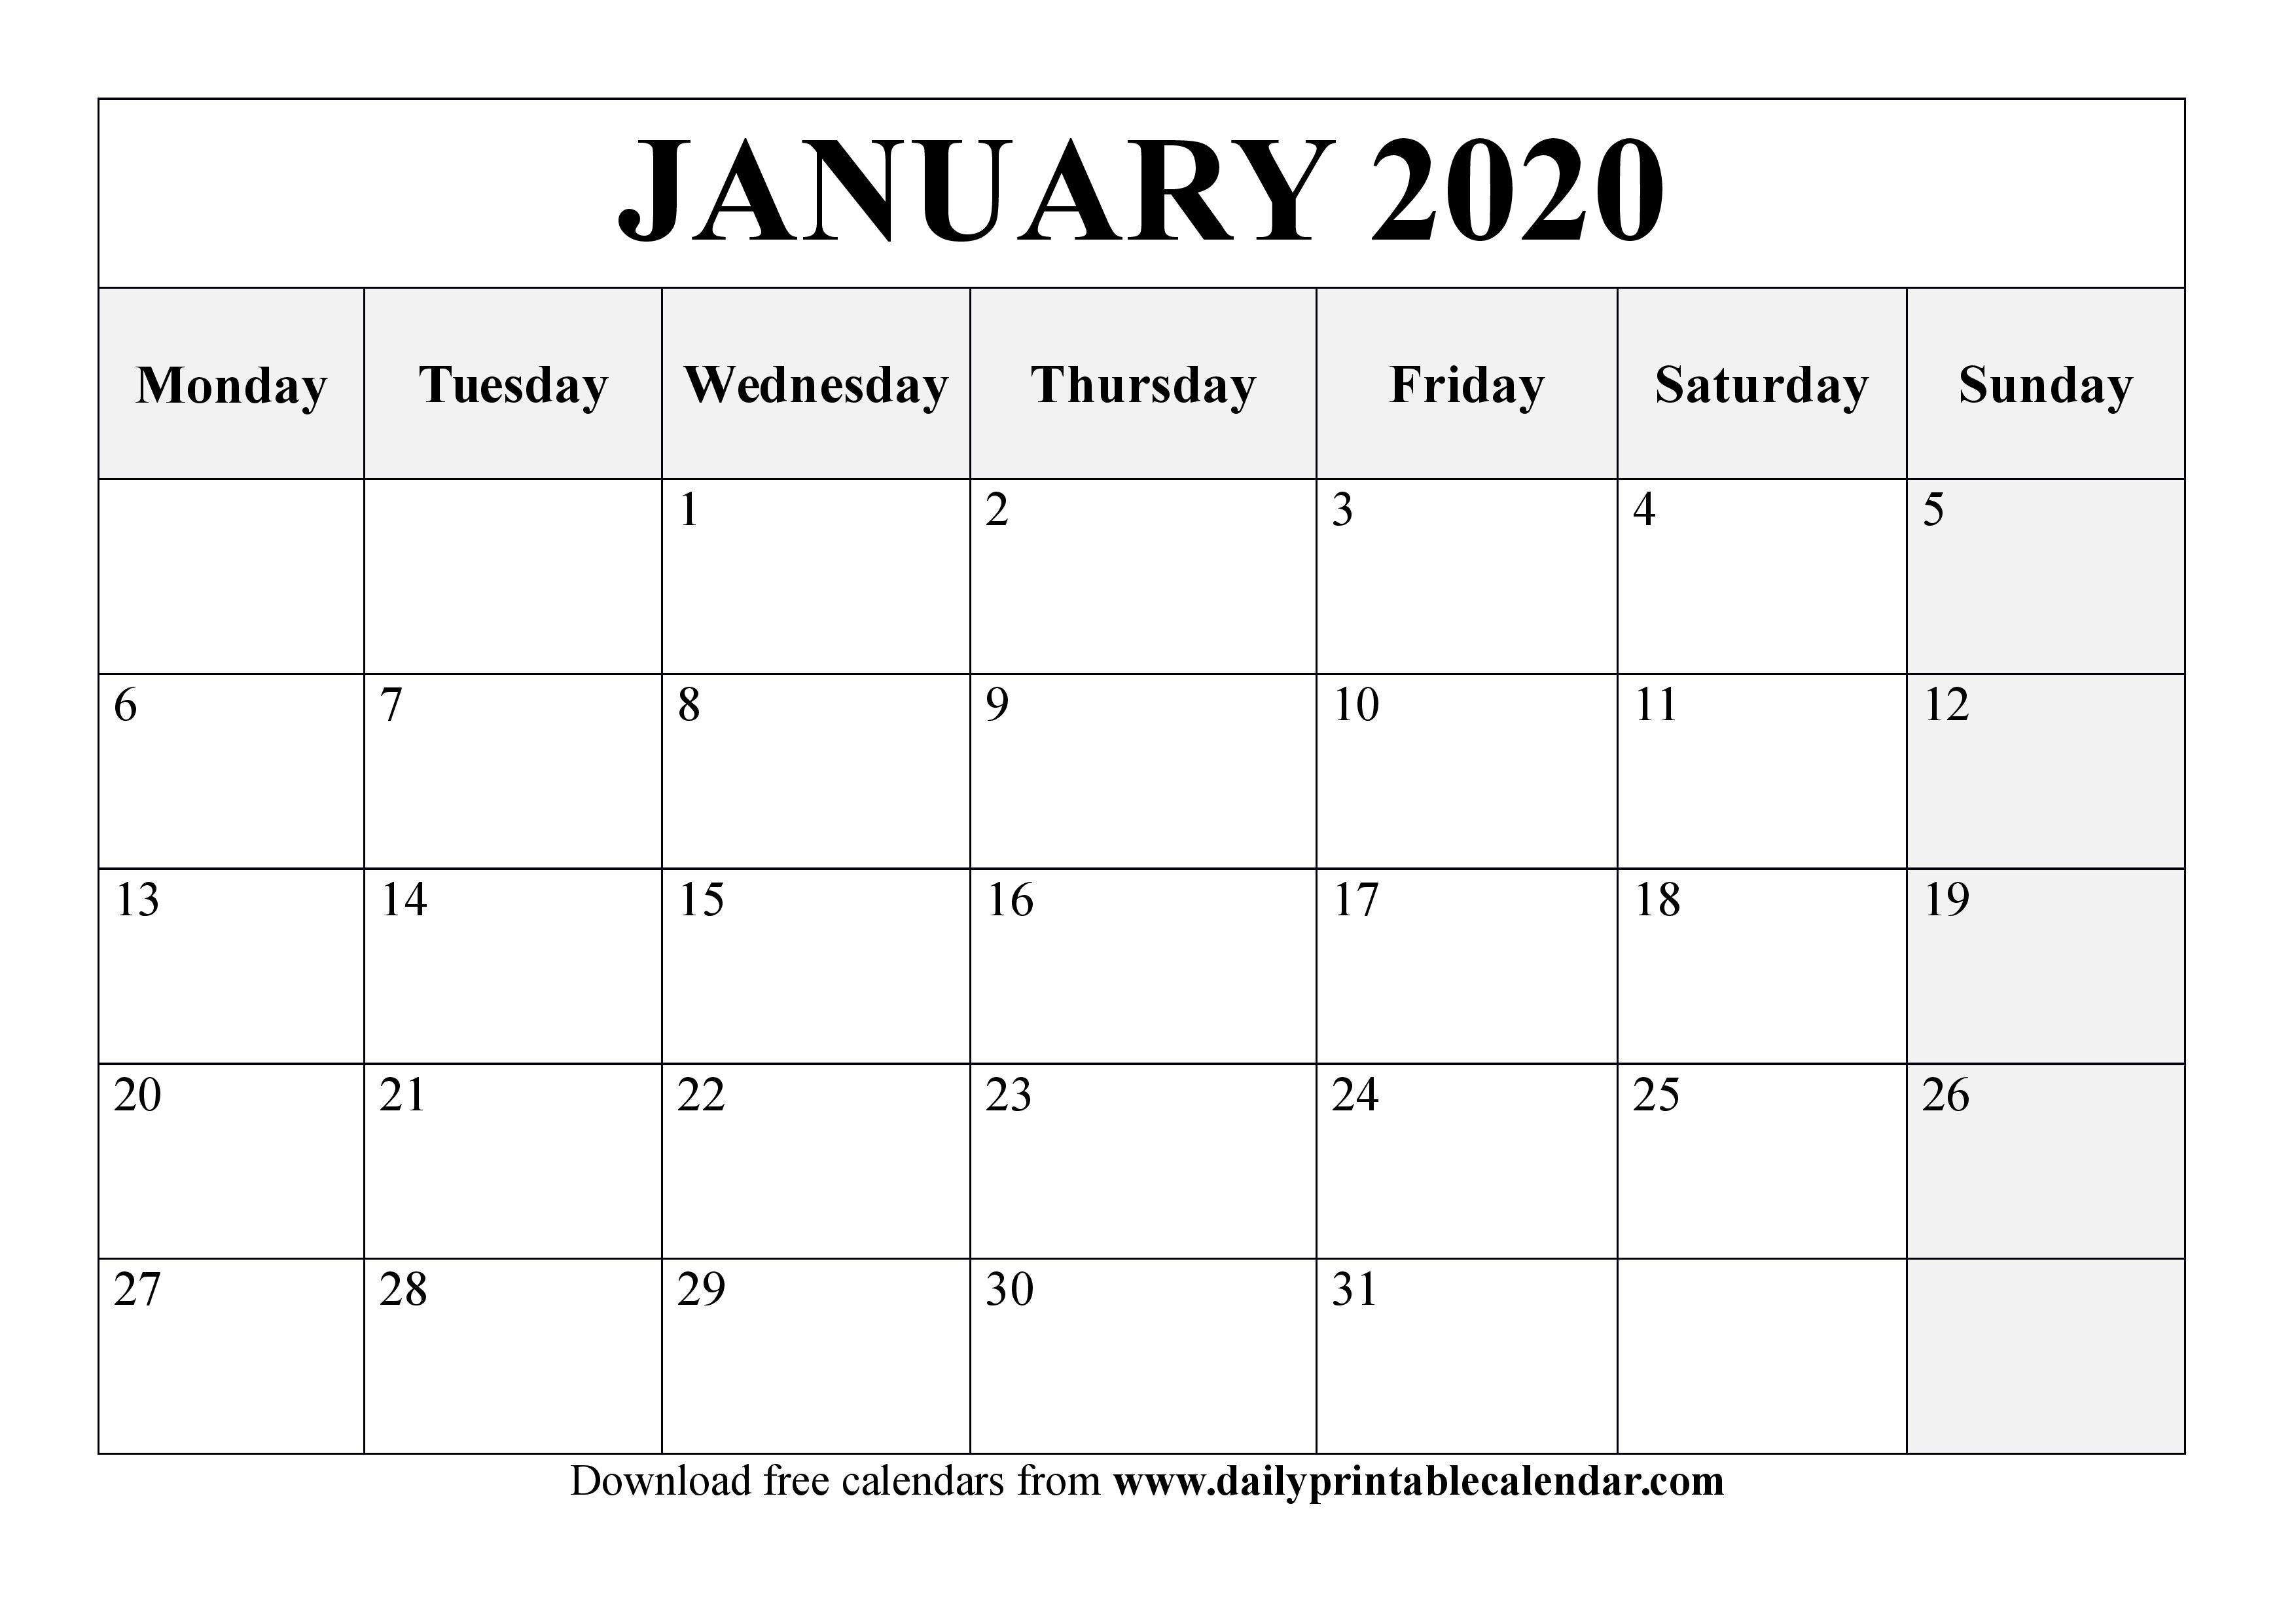 January 2020 Calendar Printable - Blank Templates - 2020 throughout 2020 Printable Calendars Beginning With Monday